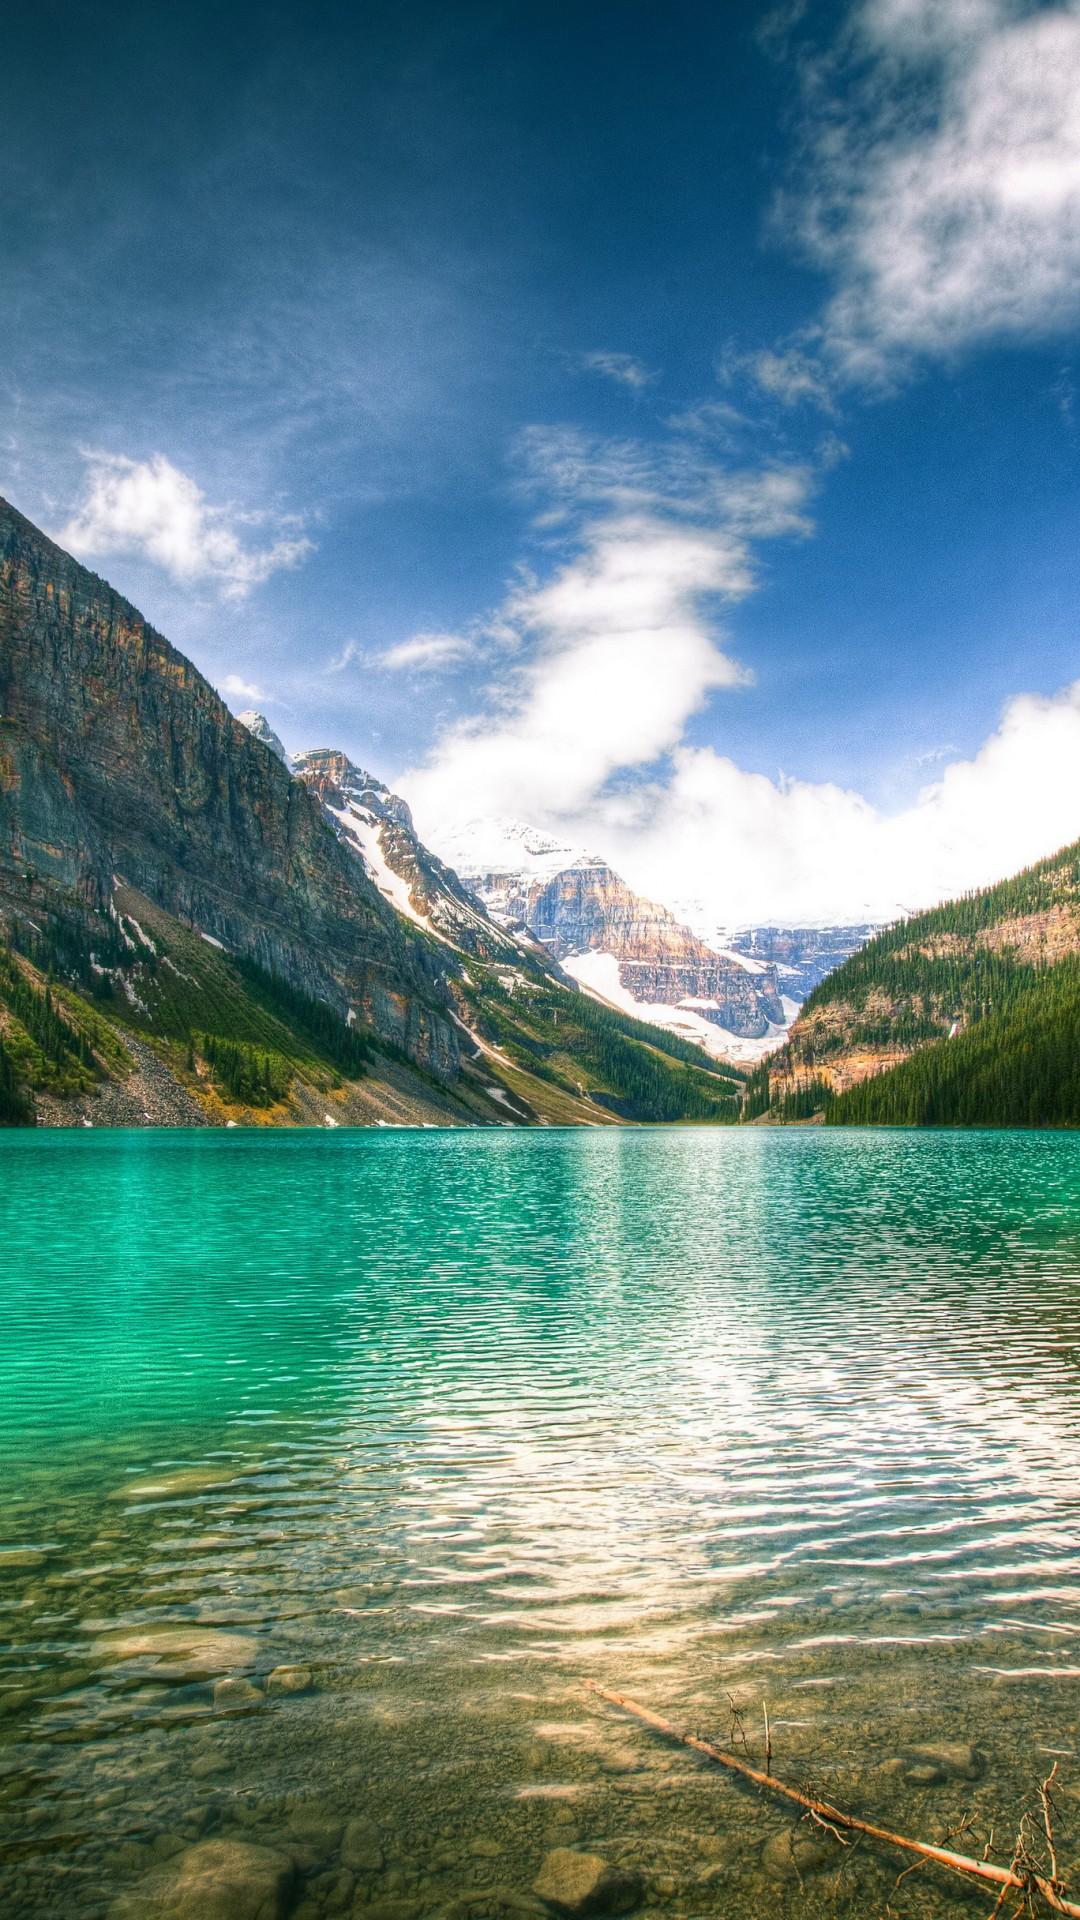 Wallpaper Lake Louise 5k 4k Wallpaper Canada National